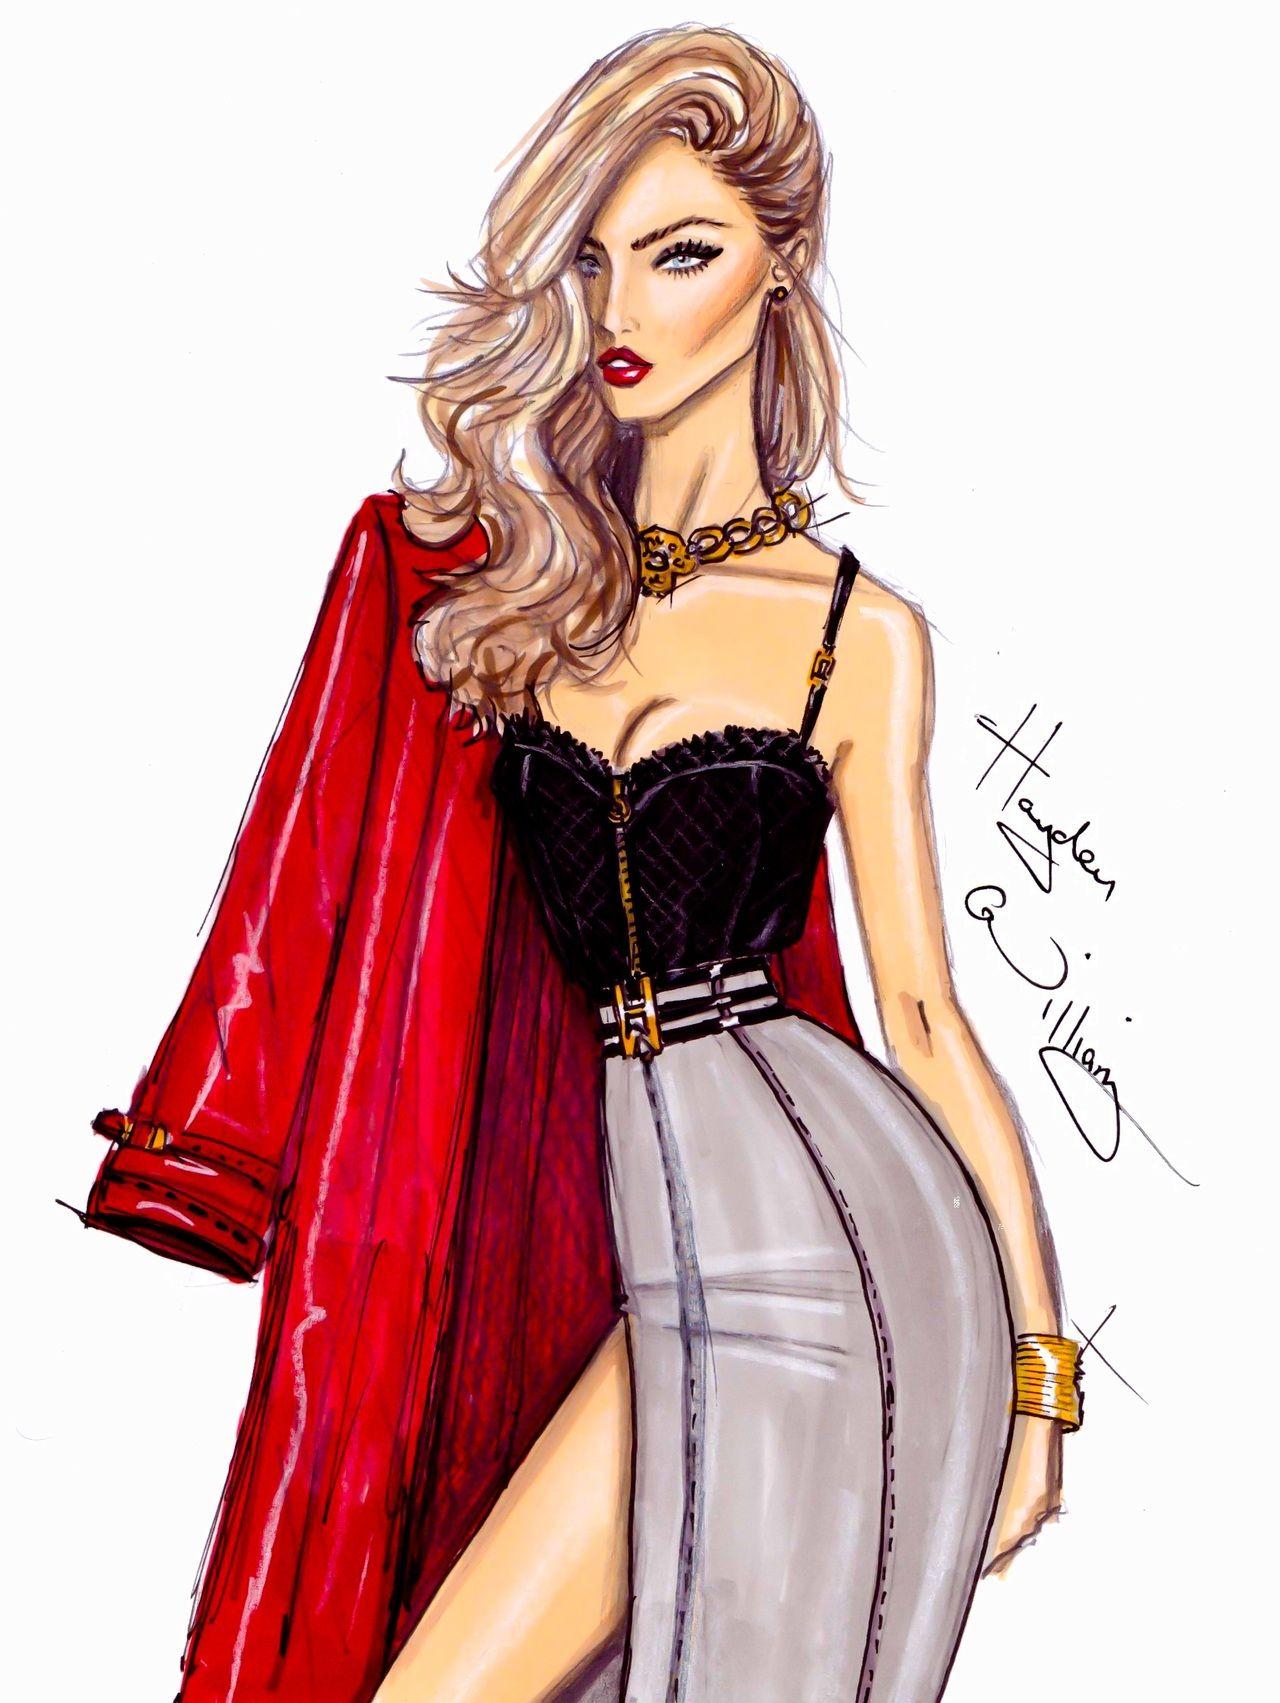 17 Best images about Fashion illustration & sketch on Pinterest ...